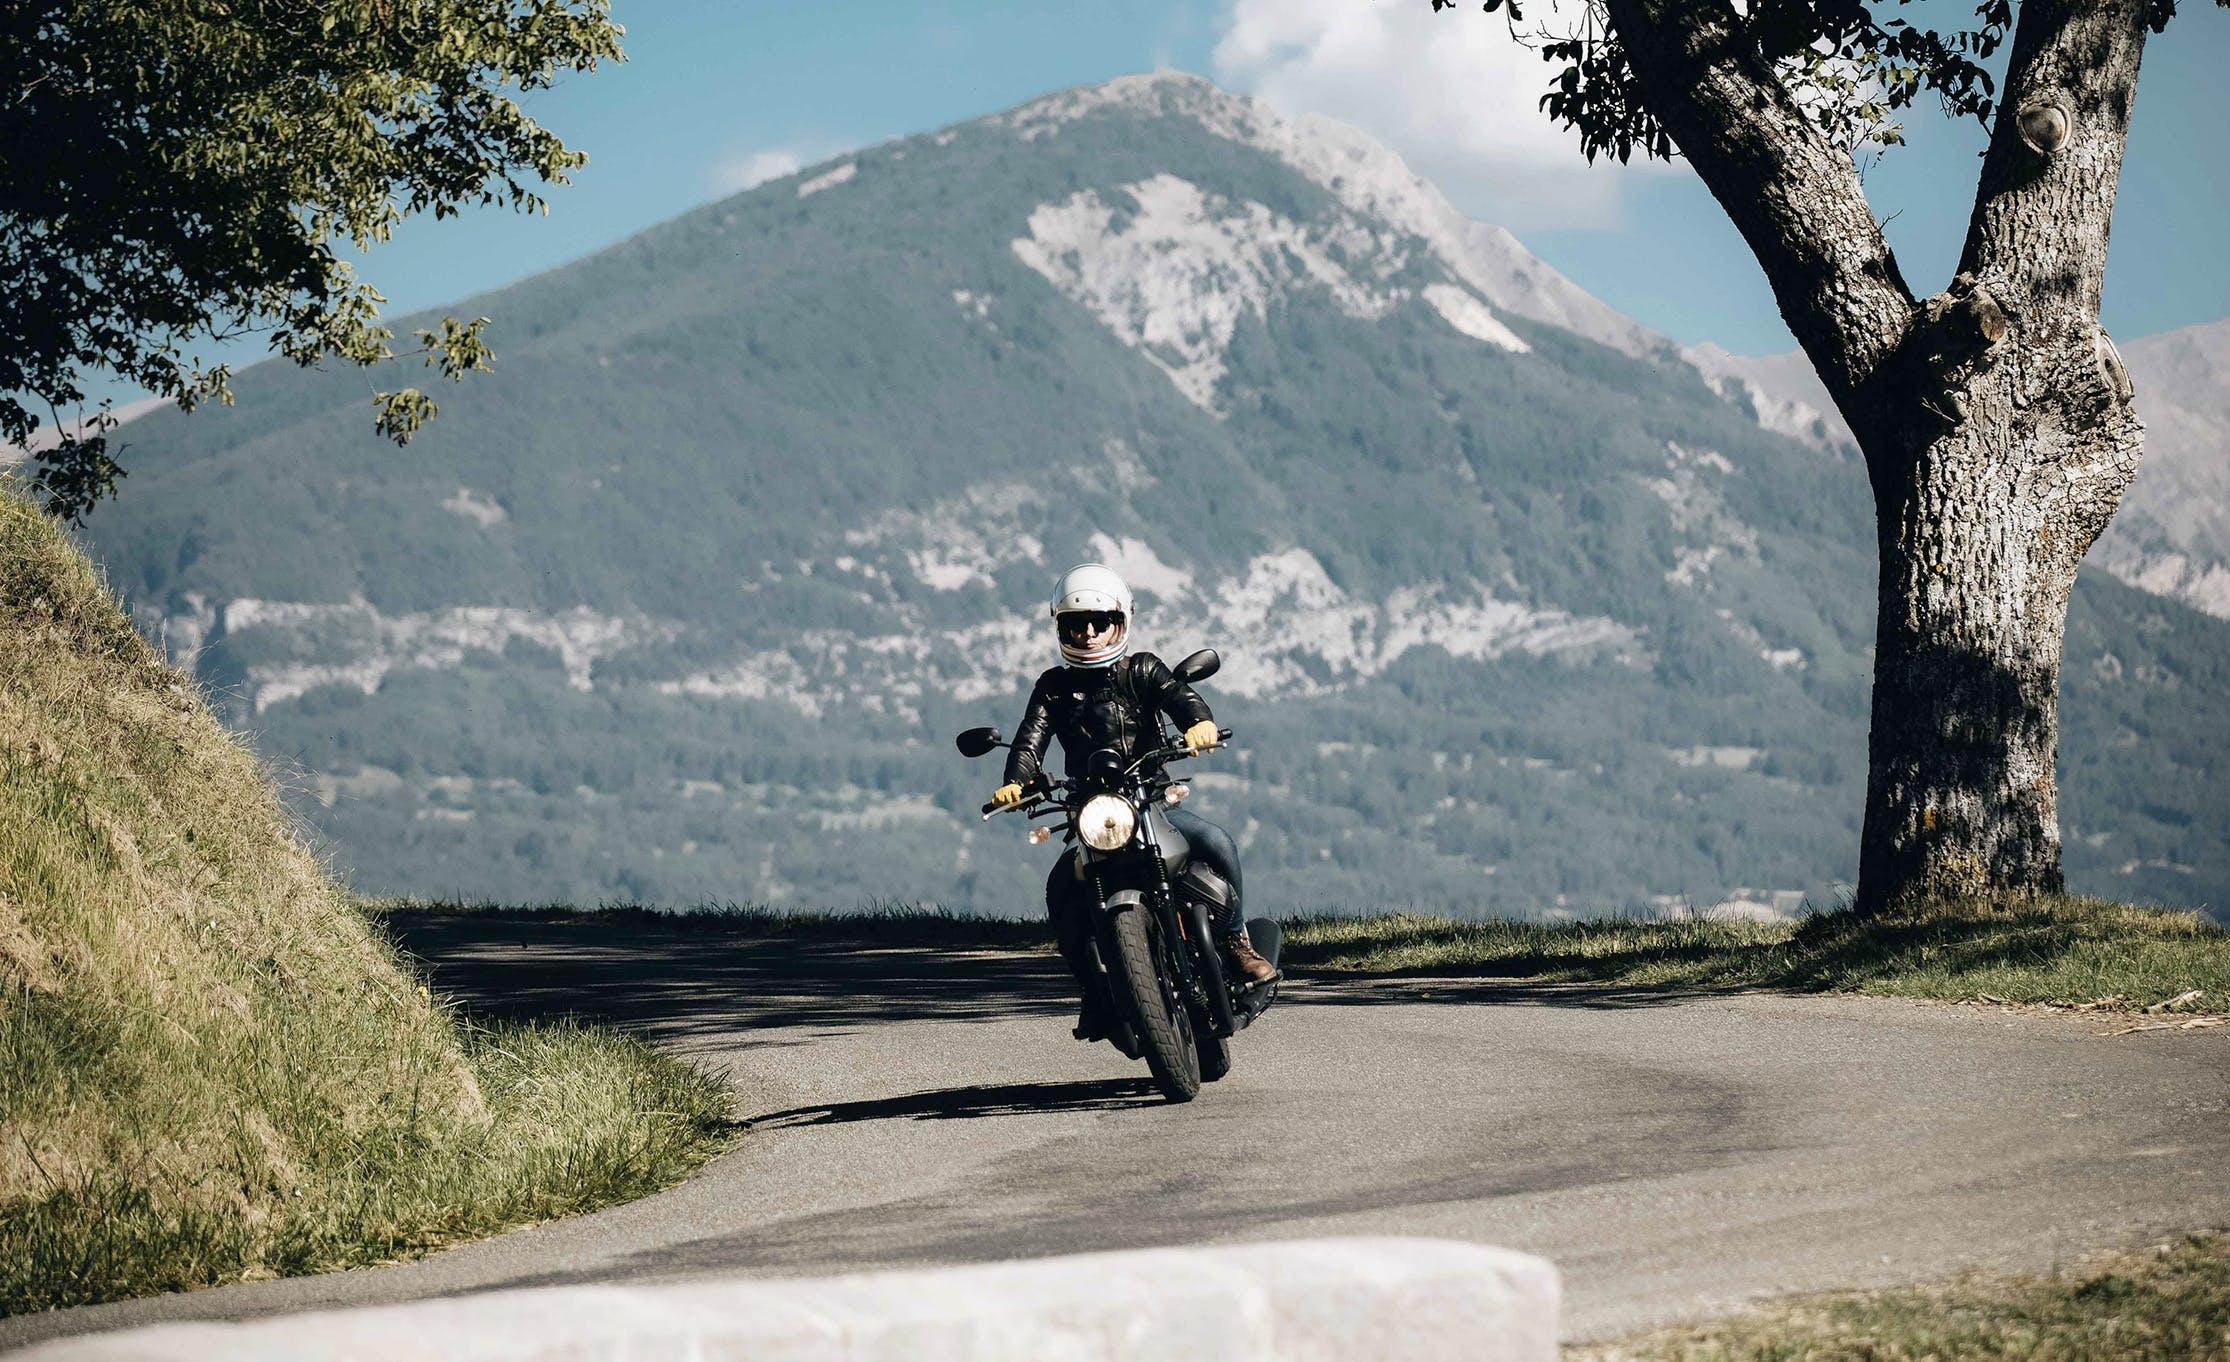 Escapada al MotoFestival Alpes Aventure